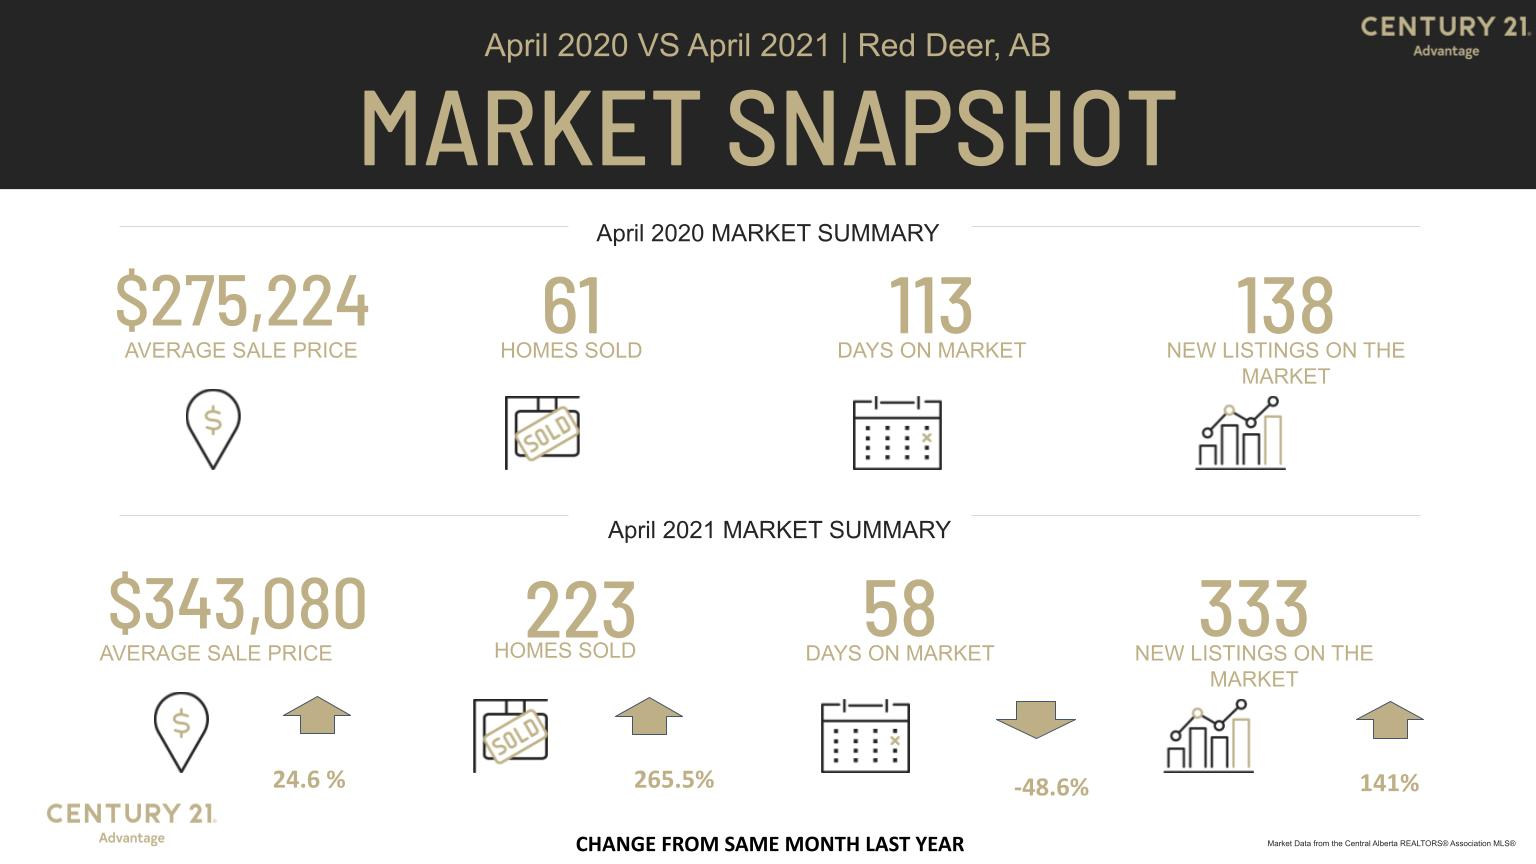 Red Deer Real Estate Market April versus April MLS Stats from Century 21 Advantage